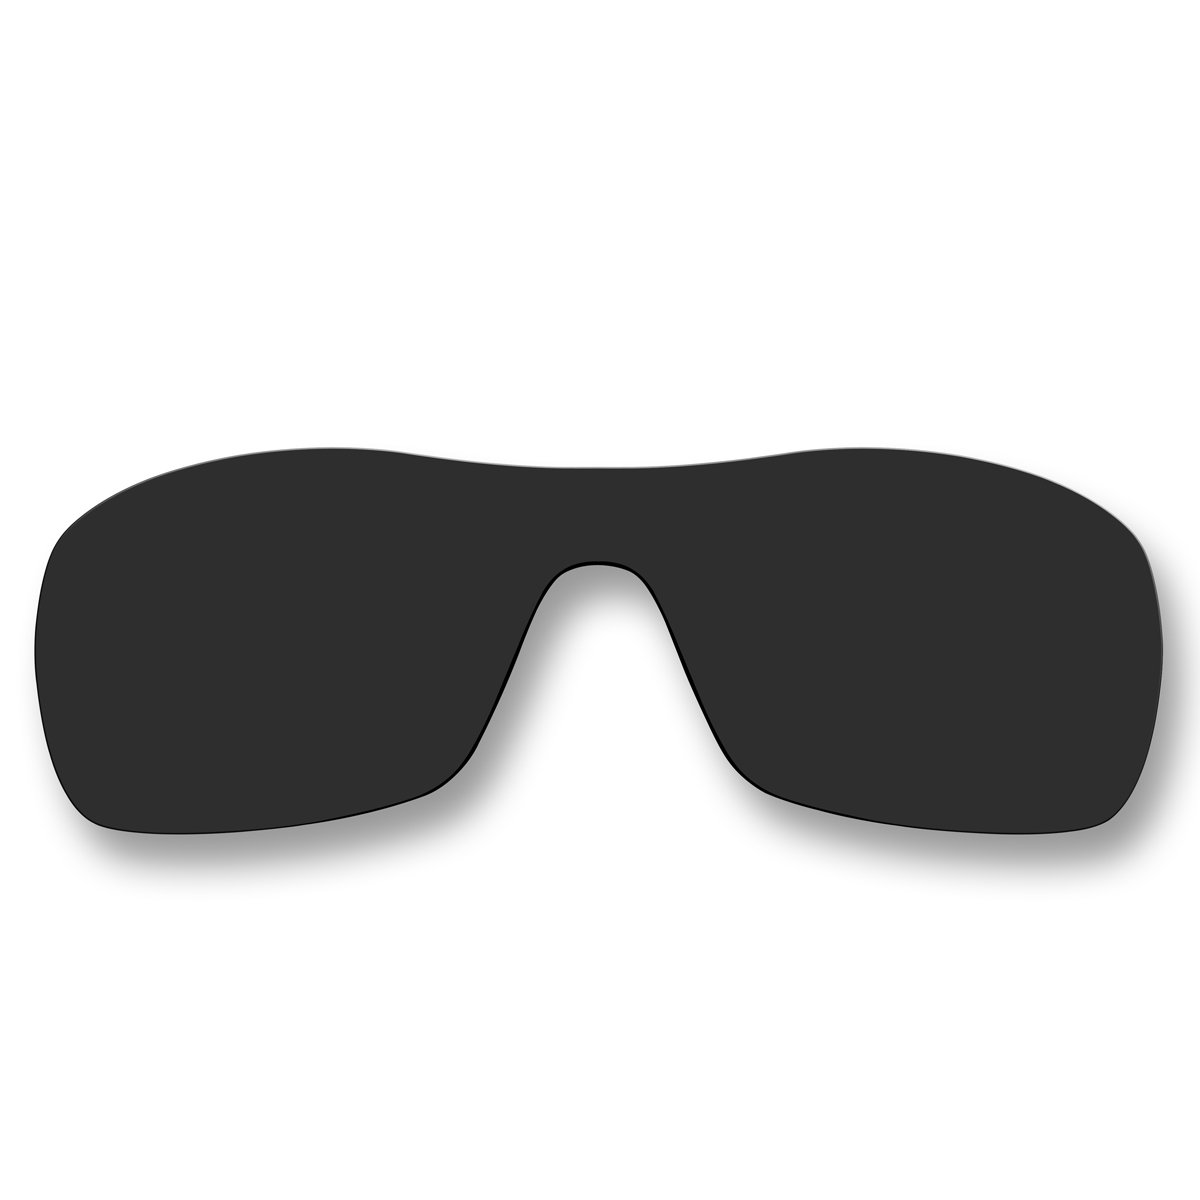 Amazon.com  Replacement Polarized Lenses for Oakley Antix Sunglasses  (Black)  Home Improvement a782718d39b1